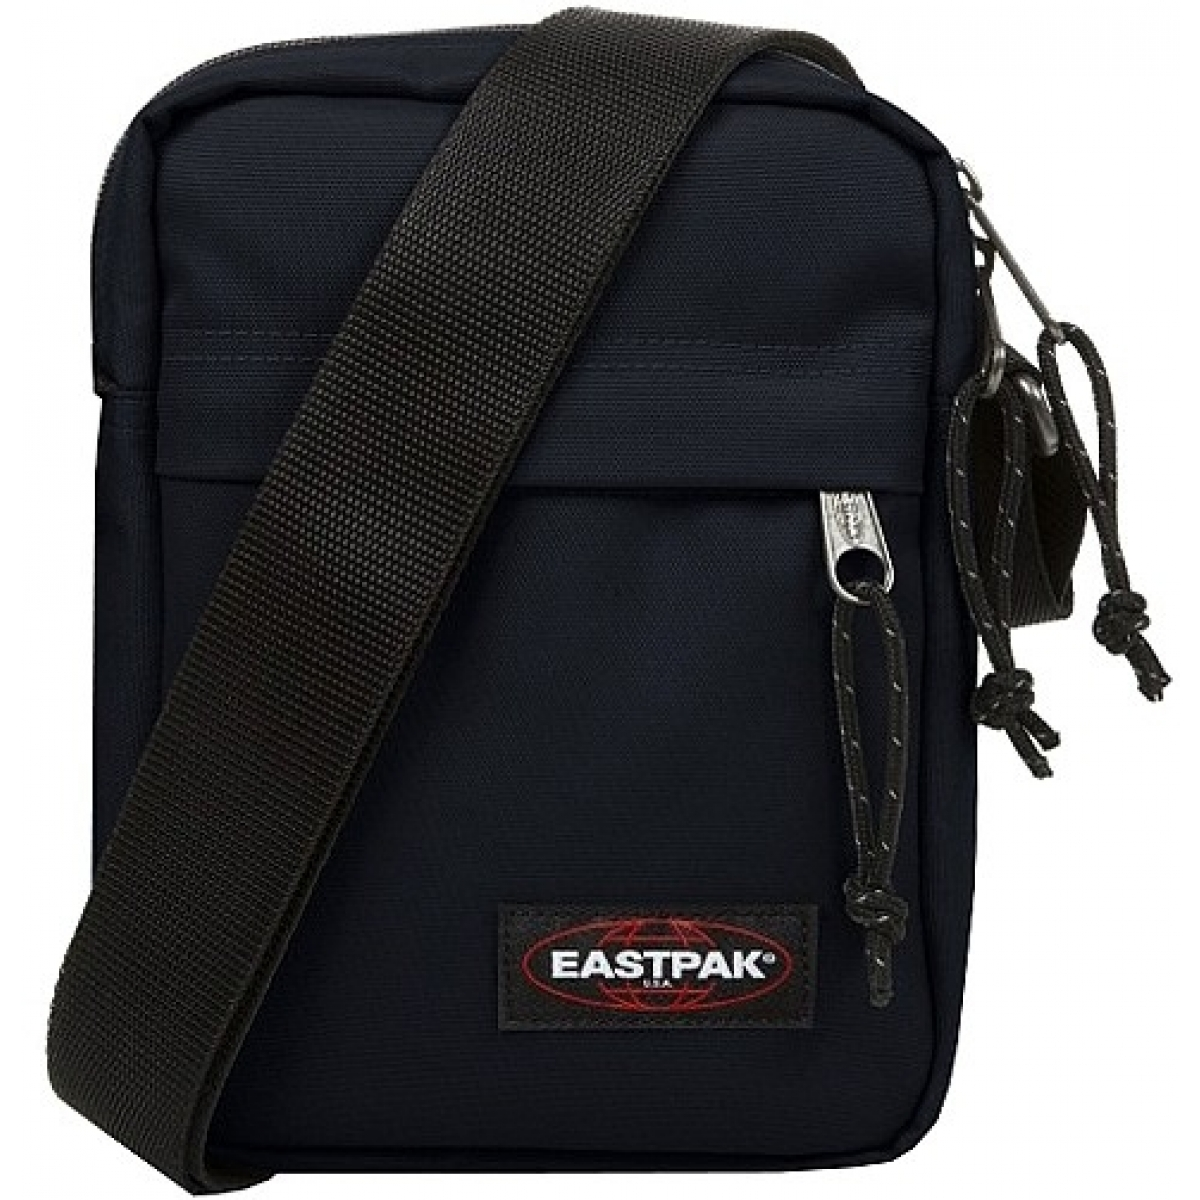 Ek04522s Ek045 Eastpak Couleur Principale Bandoulière Bleu Sac wBtPq5